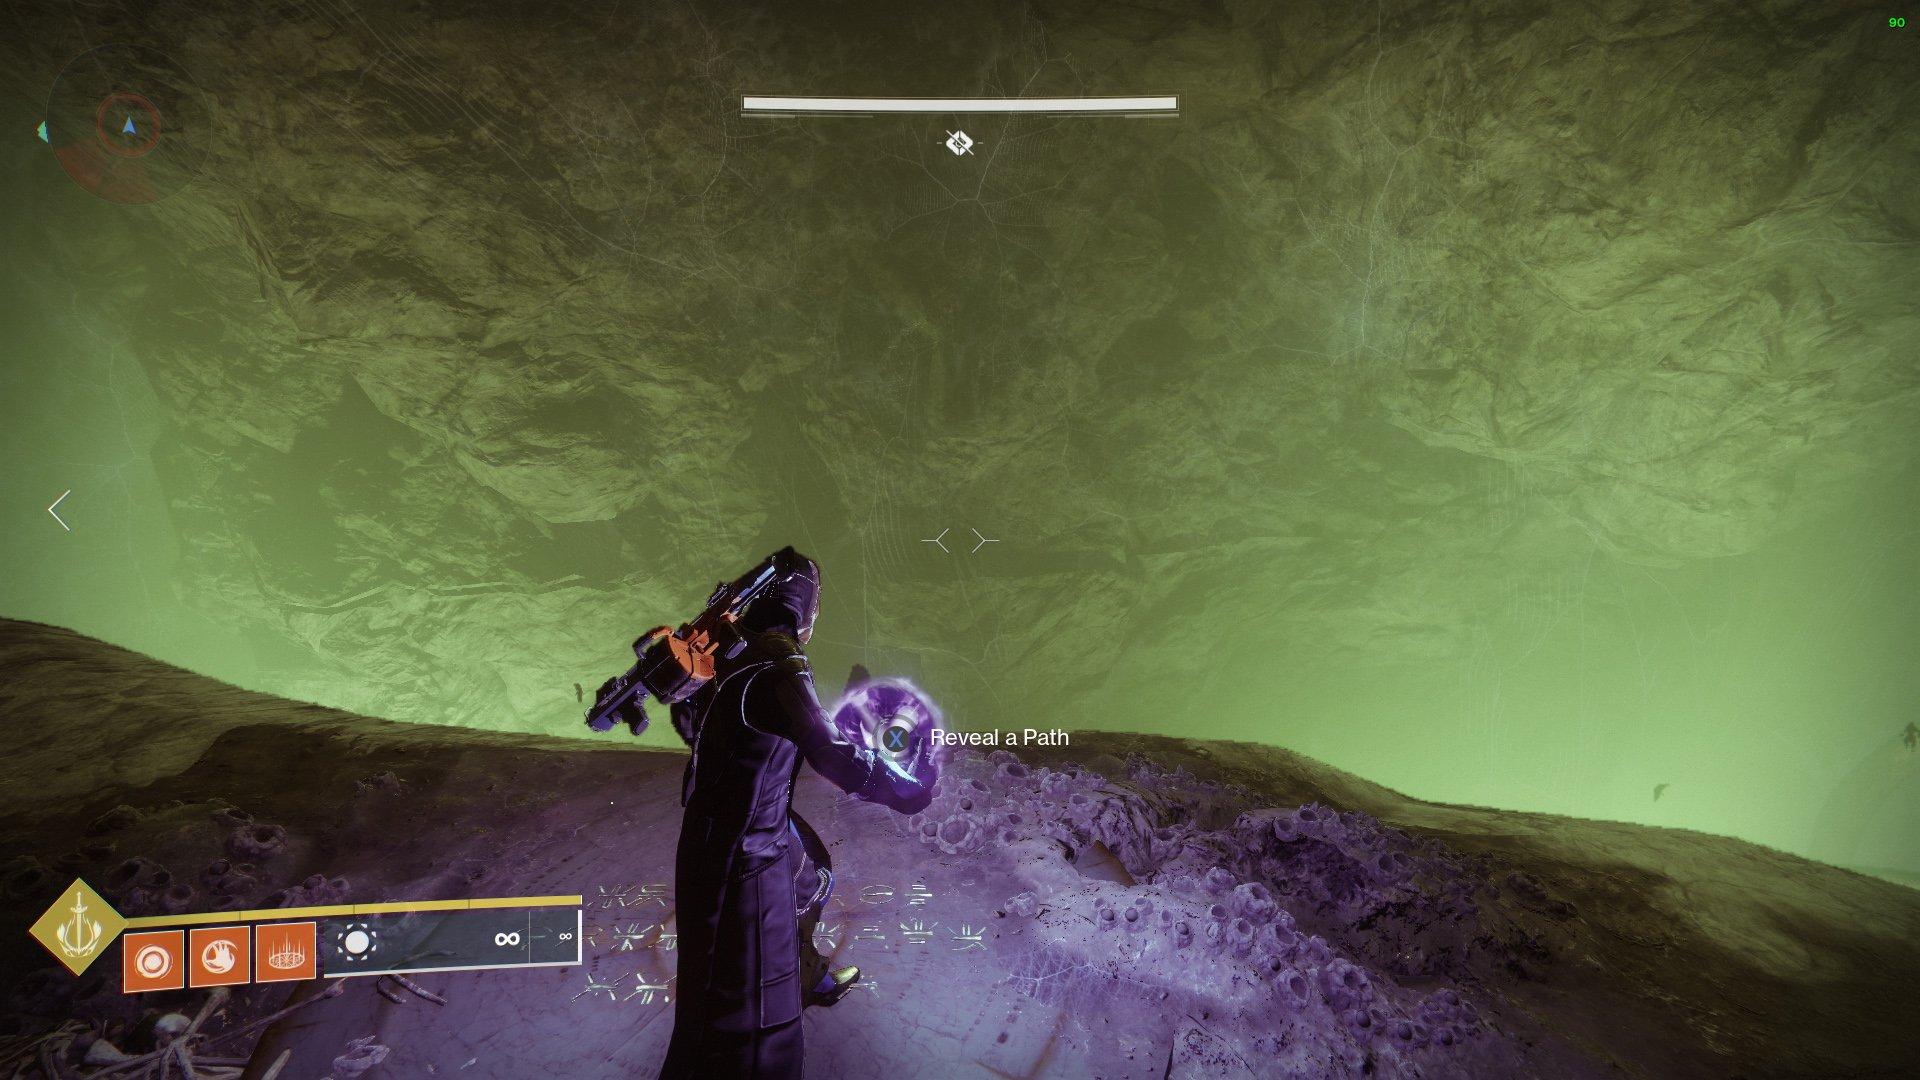 Destiny 2 Discovery Reveal a Path